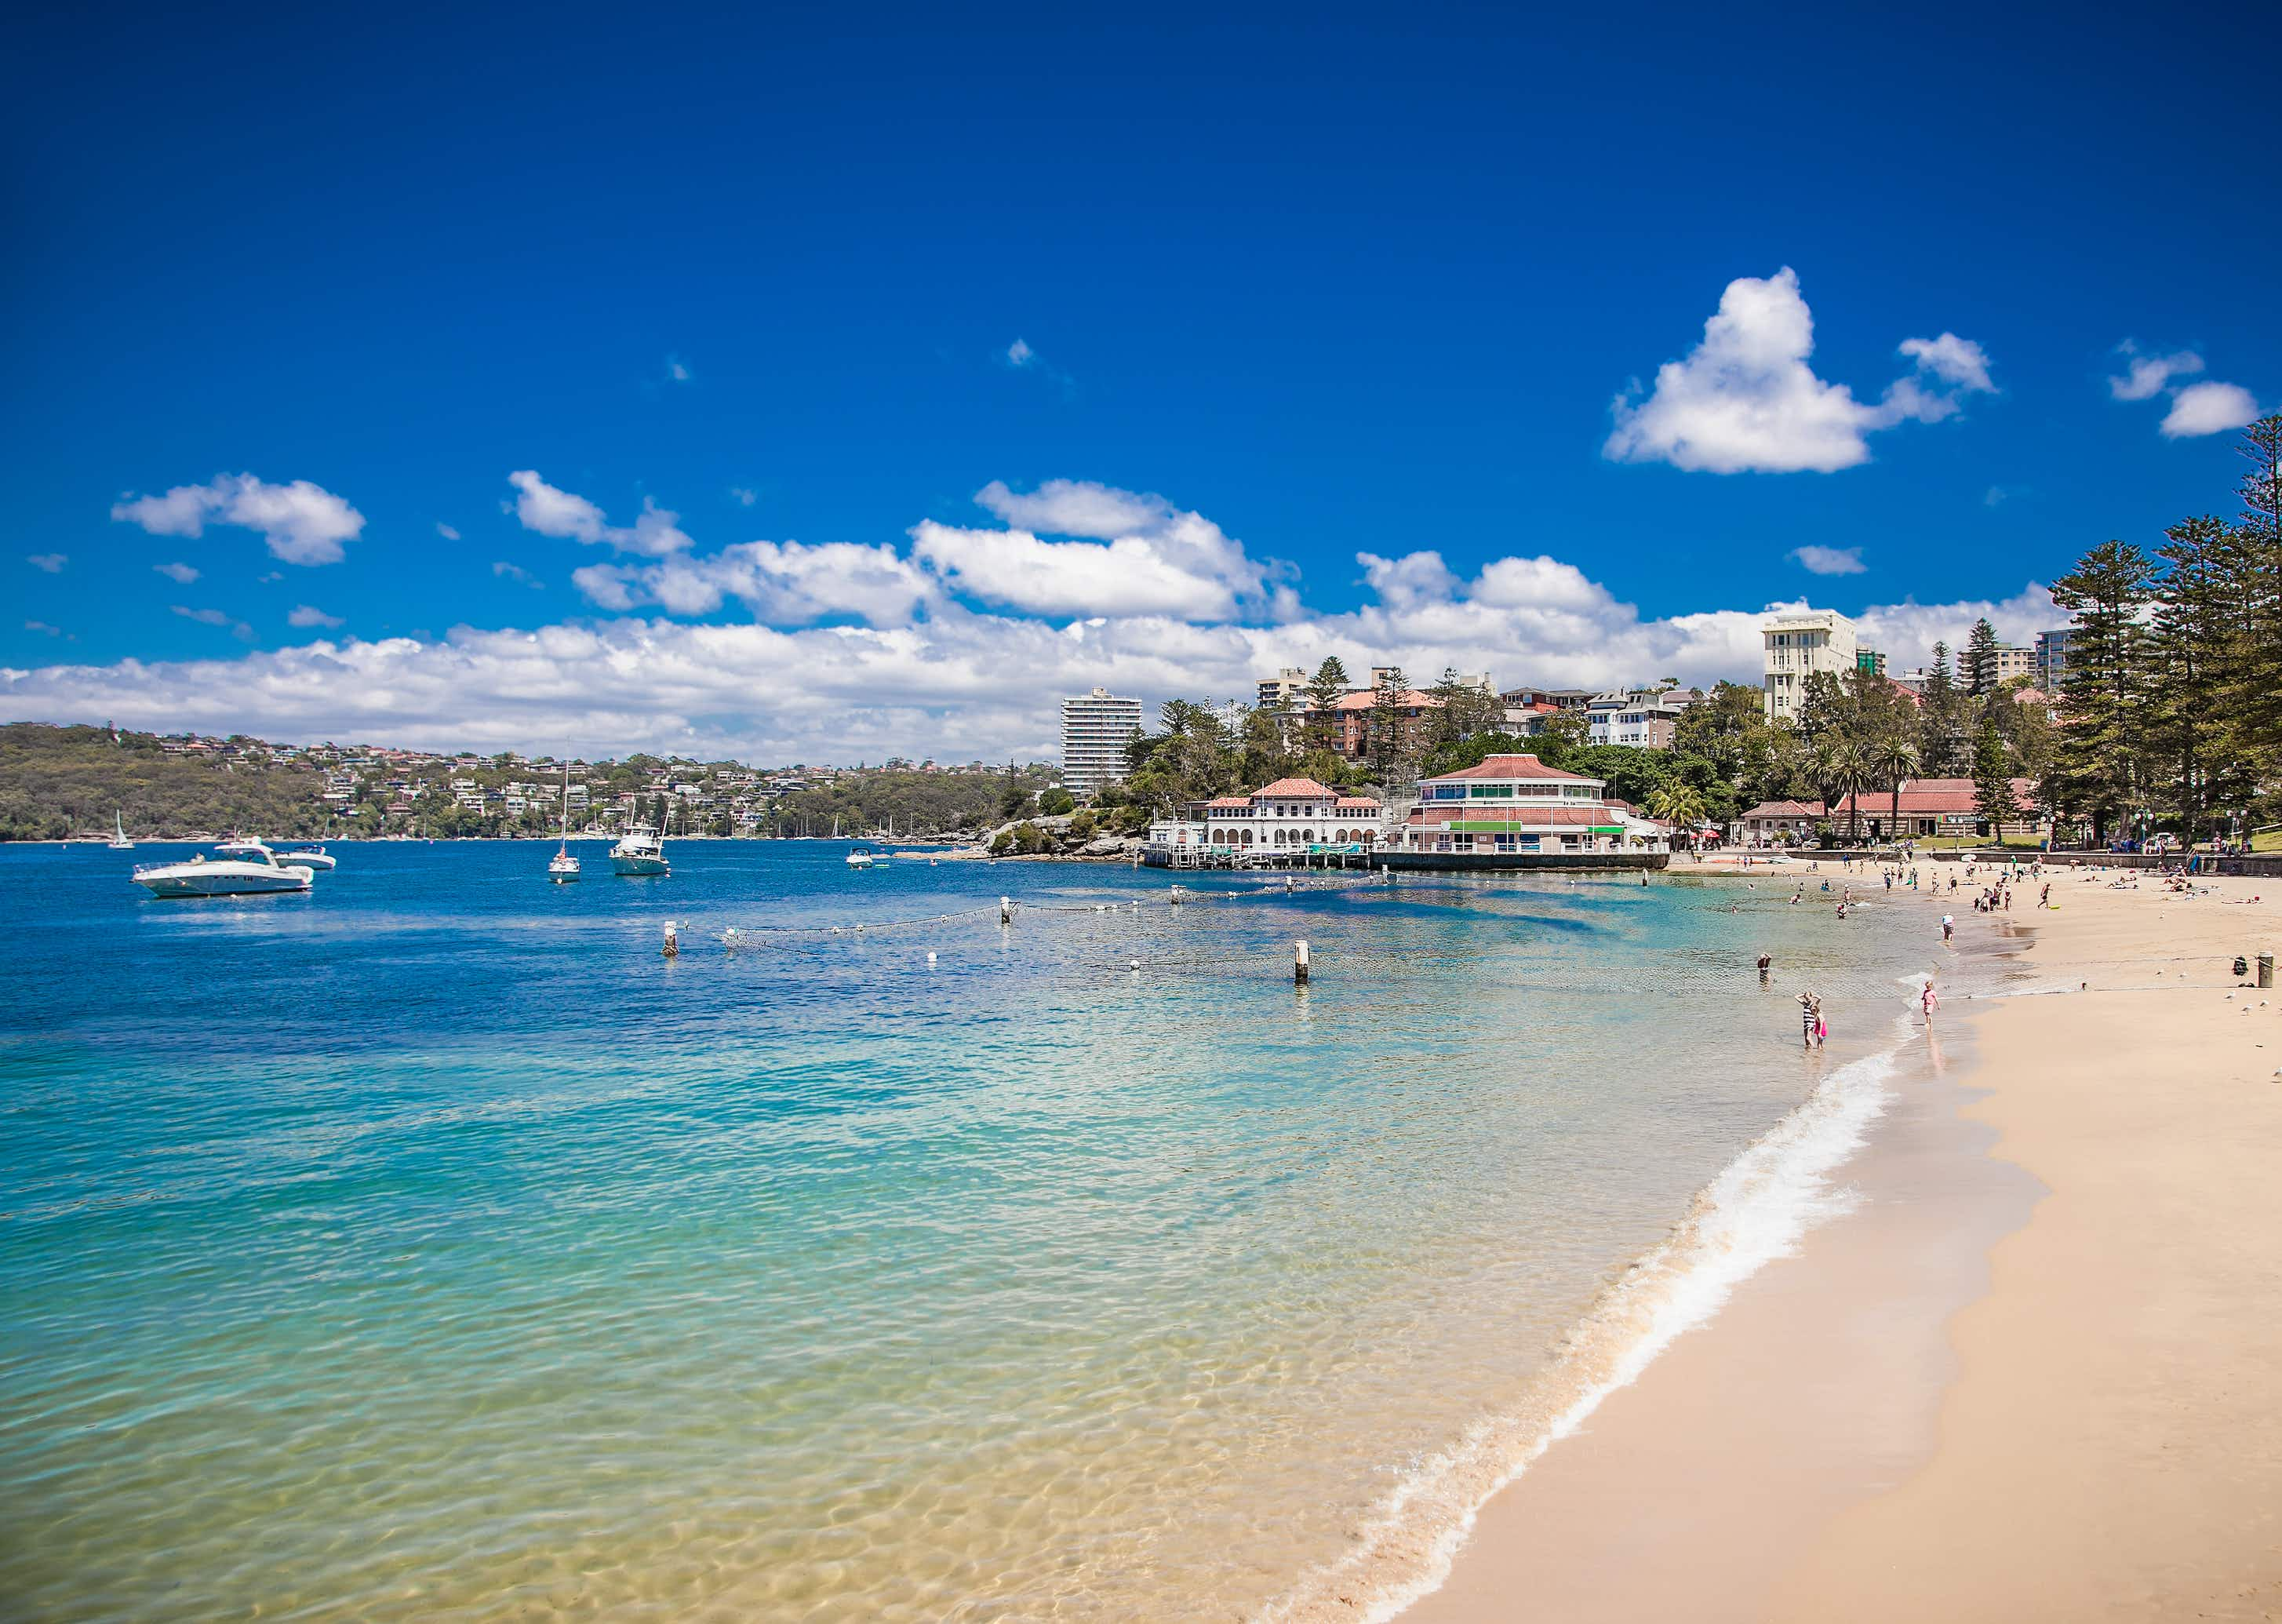 Where to find Sydney's best beaches